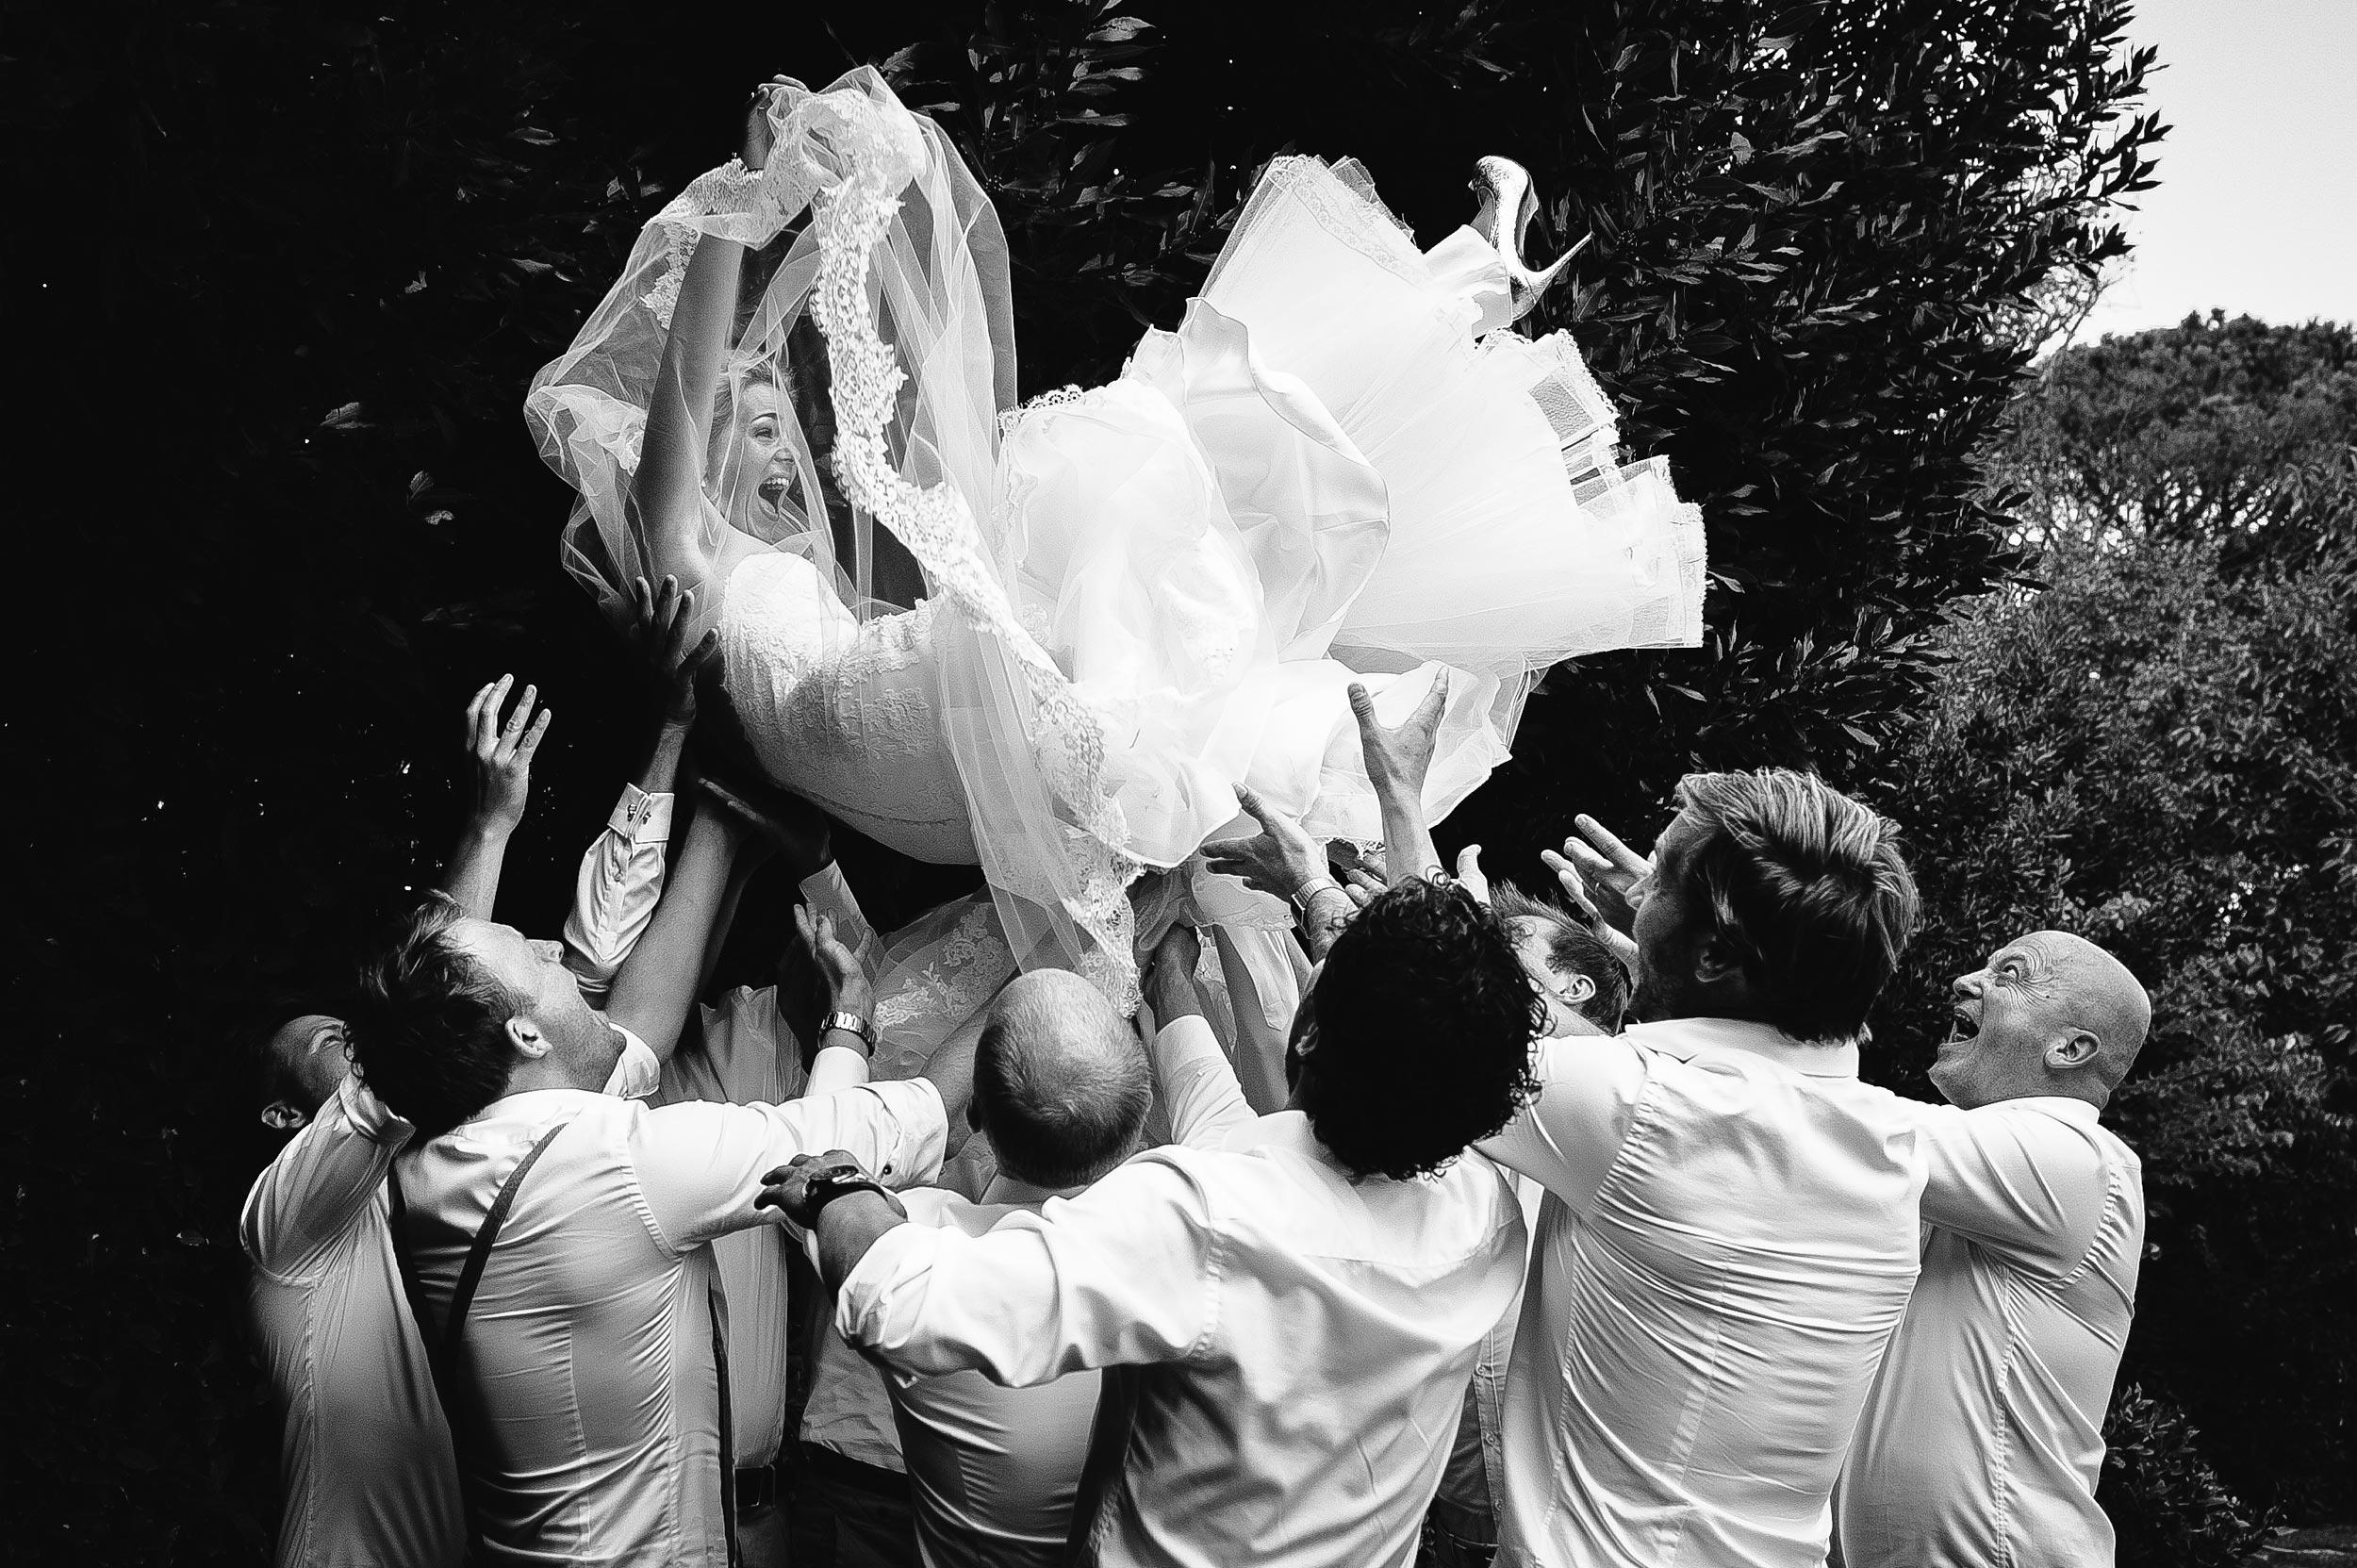 Castello di Monterado Wedding Photographer Marche Central Italy Alessandro Avenali Documentary Black And White Bride Jumping